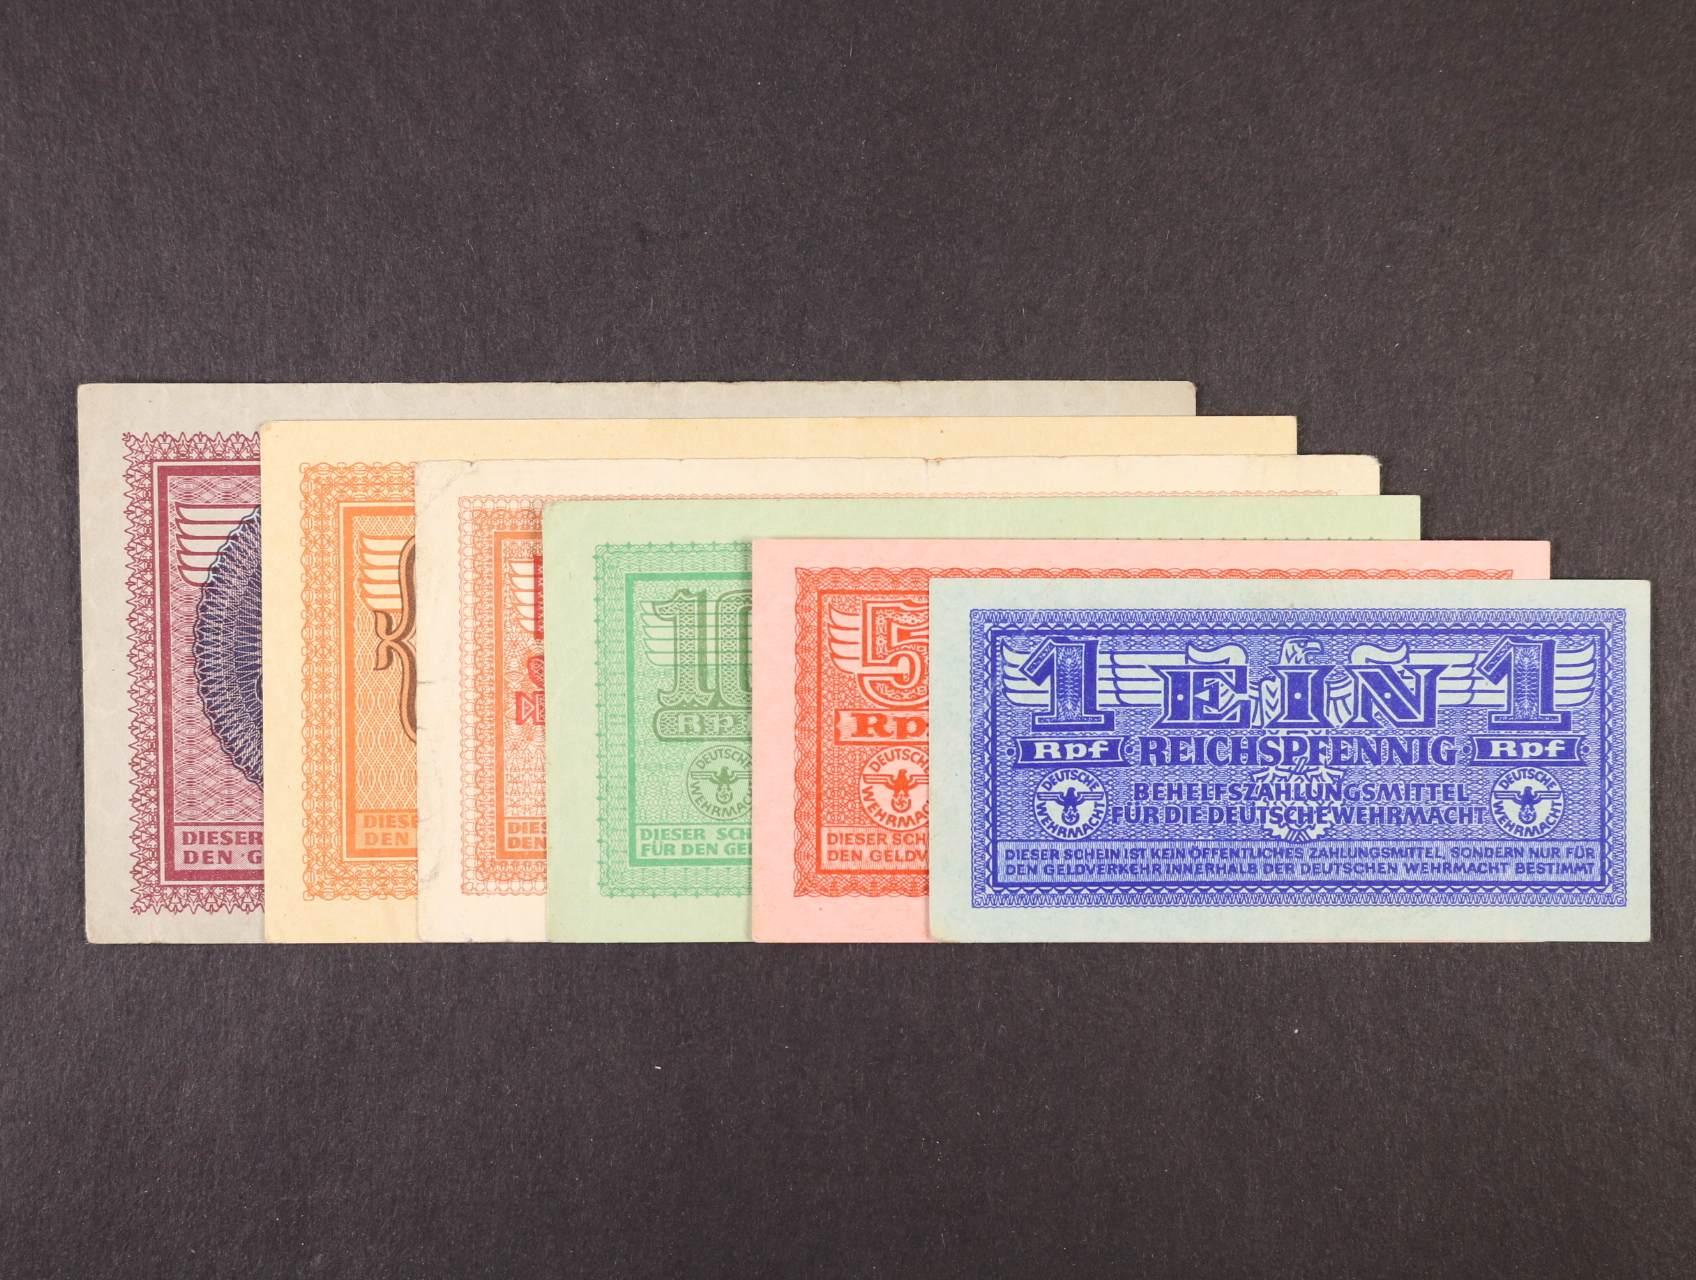 Vydání pro Wehrmacht 1940 - 42, sada 1, 5, 10, 50 Rpf, 1, 2 RM b.d., Ro. 501 - 506